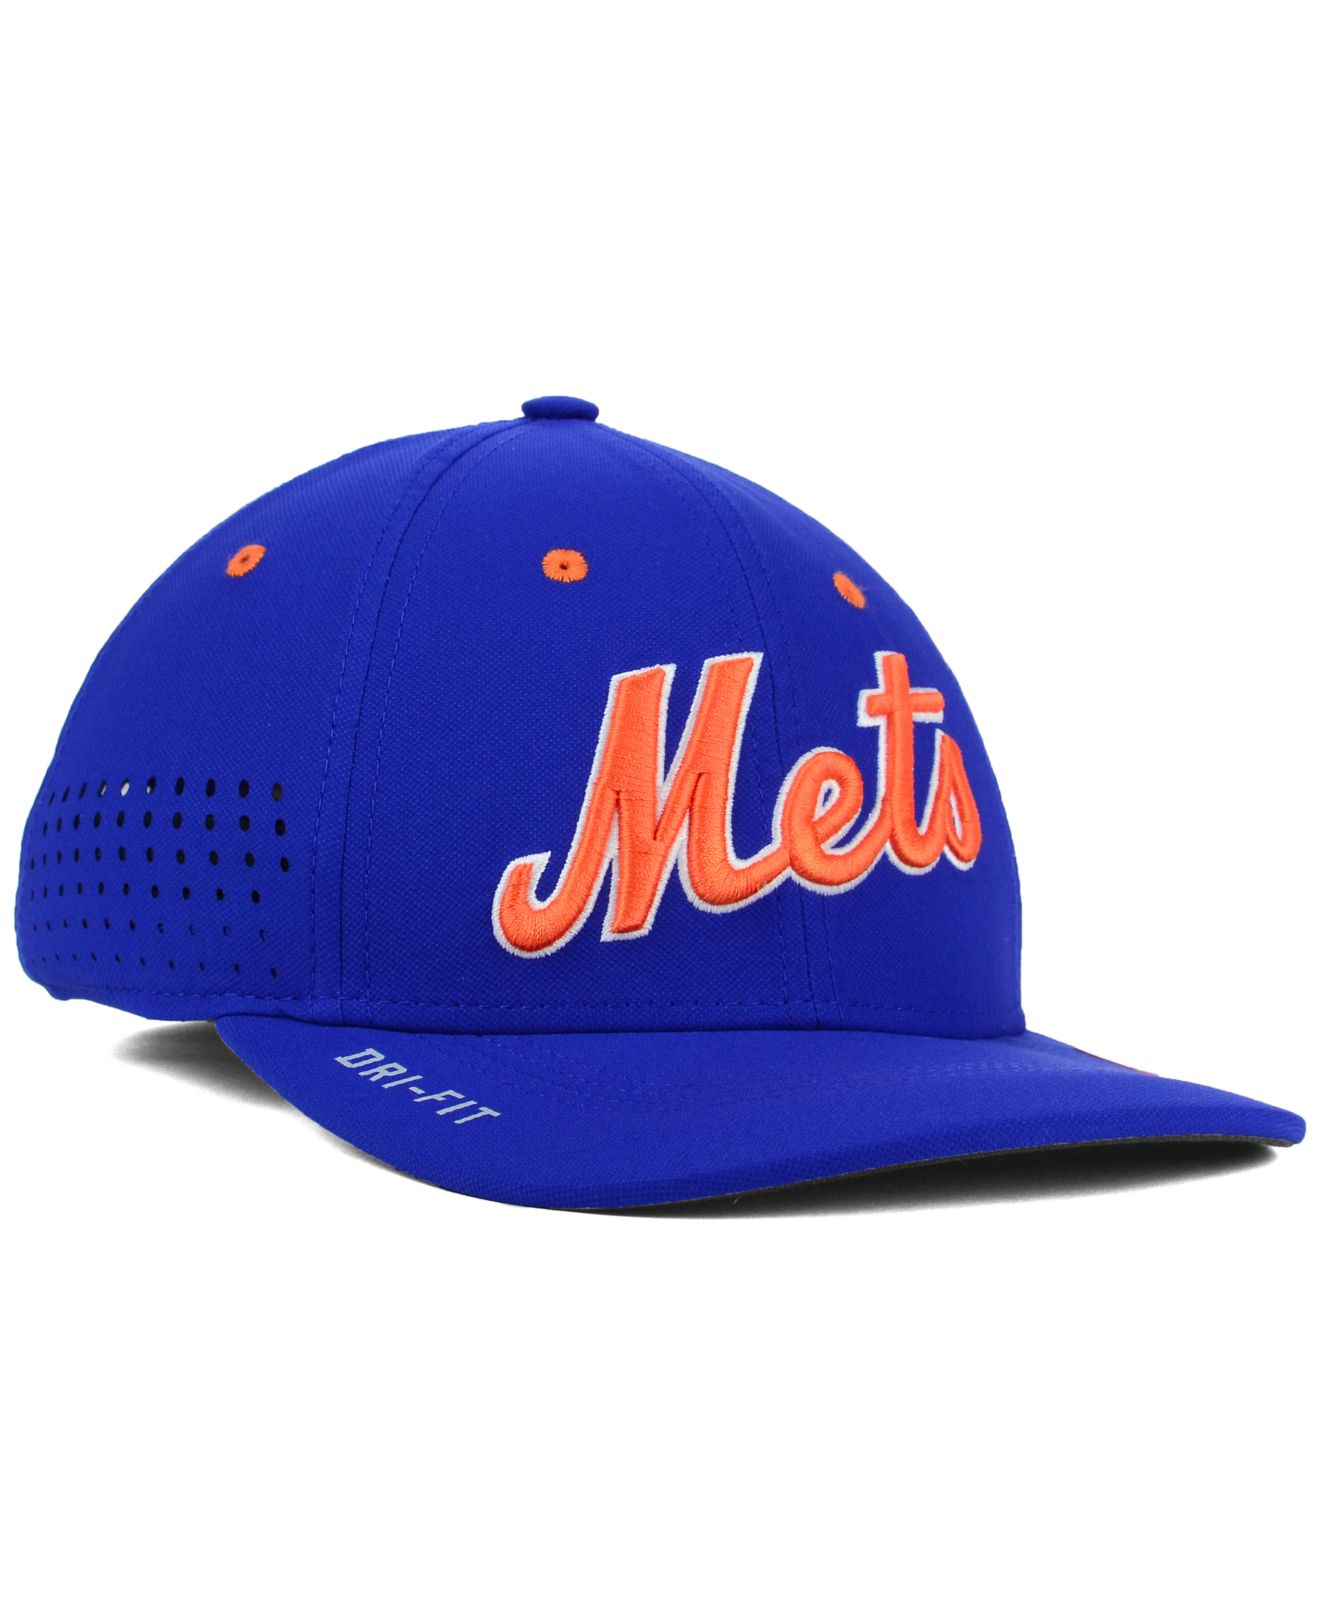 Lyst - Nike New York Mets Vapor Swoosh Flex Cap in Blue for Men 70daeffd88a2